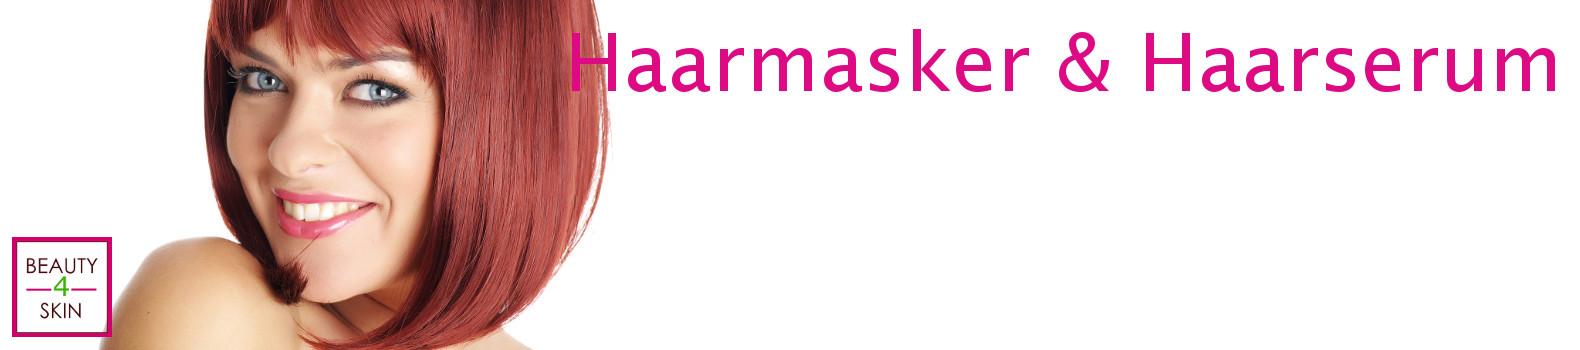 Haarmasker & Haarserum